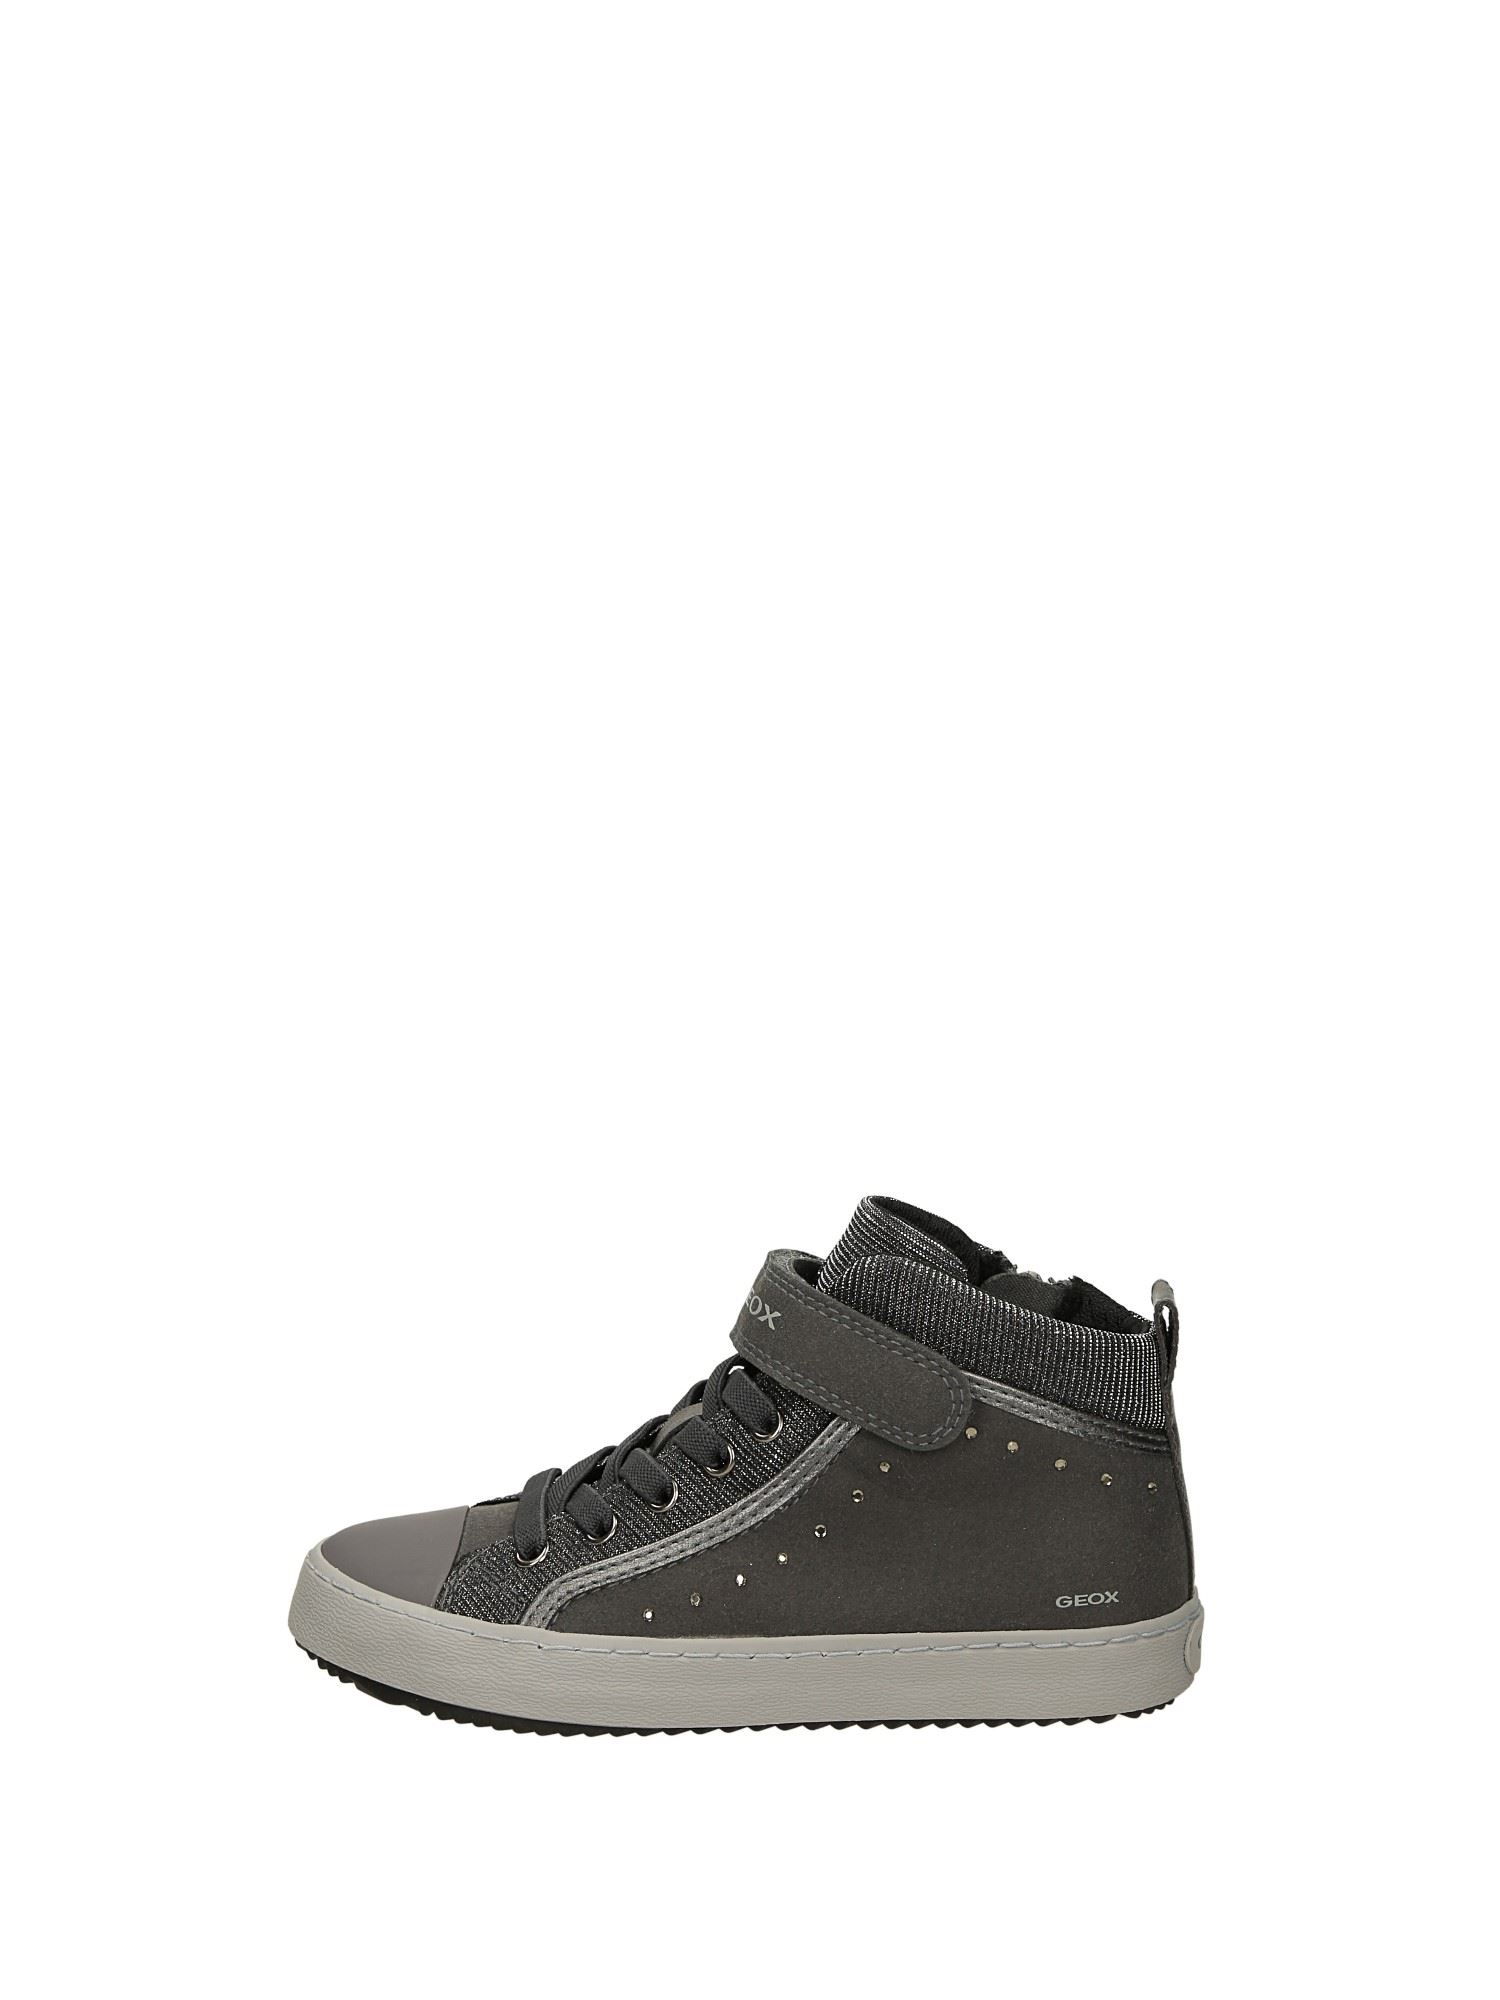 Sneakers-Alta-Bambina-Geox-J744GI-Autunno-Inverno